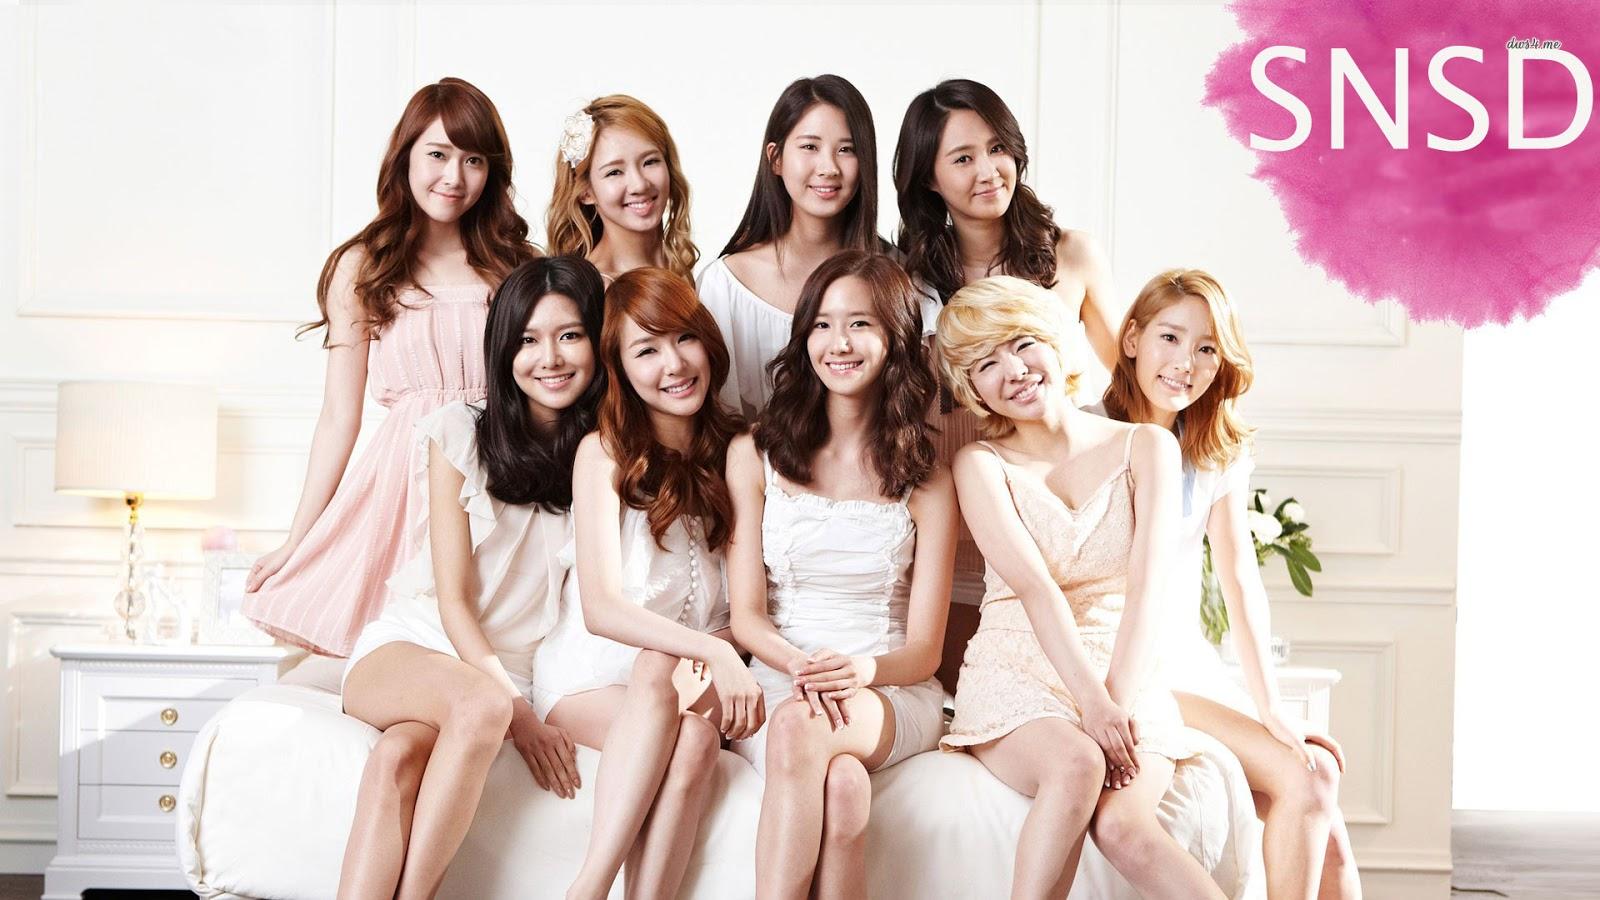 girls generation hd - photo #22